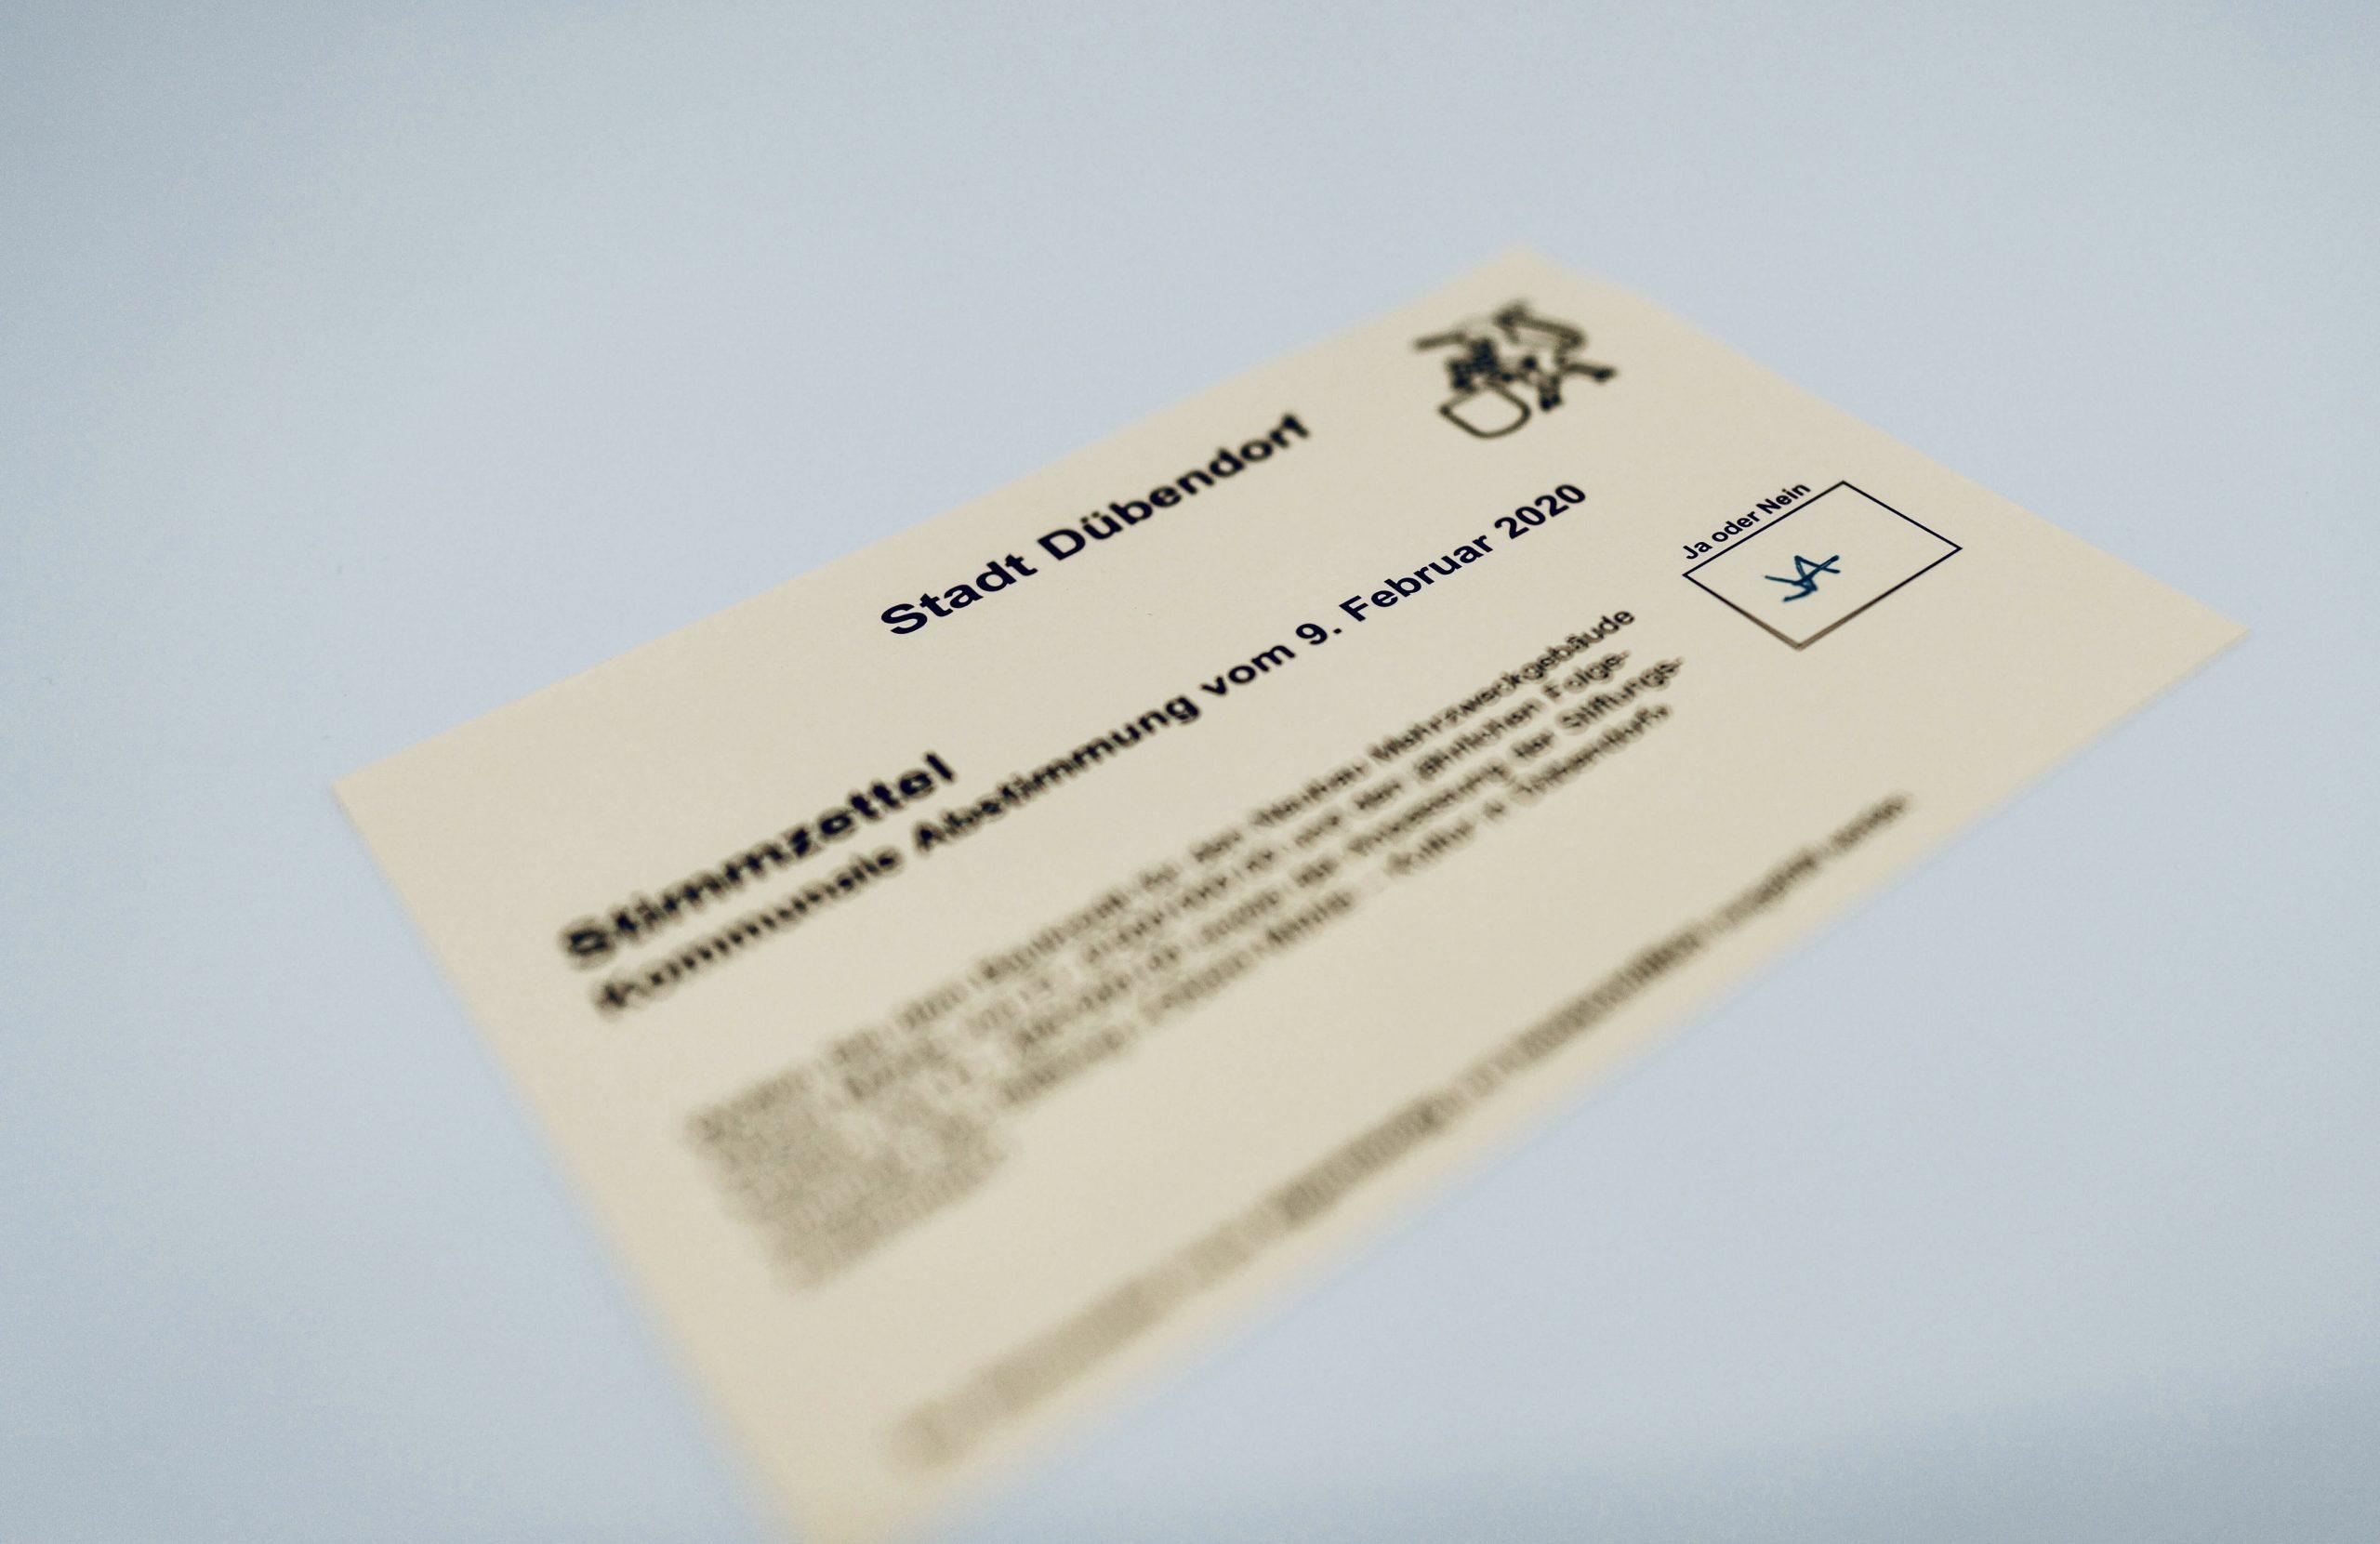 формат печати визиток в Германии